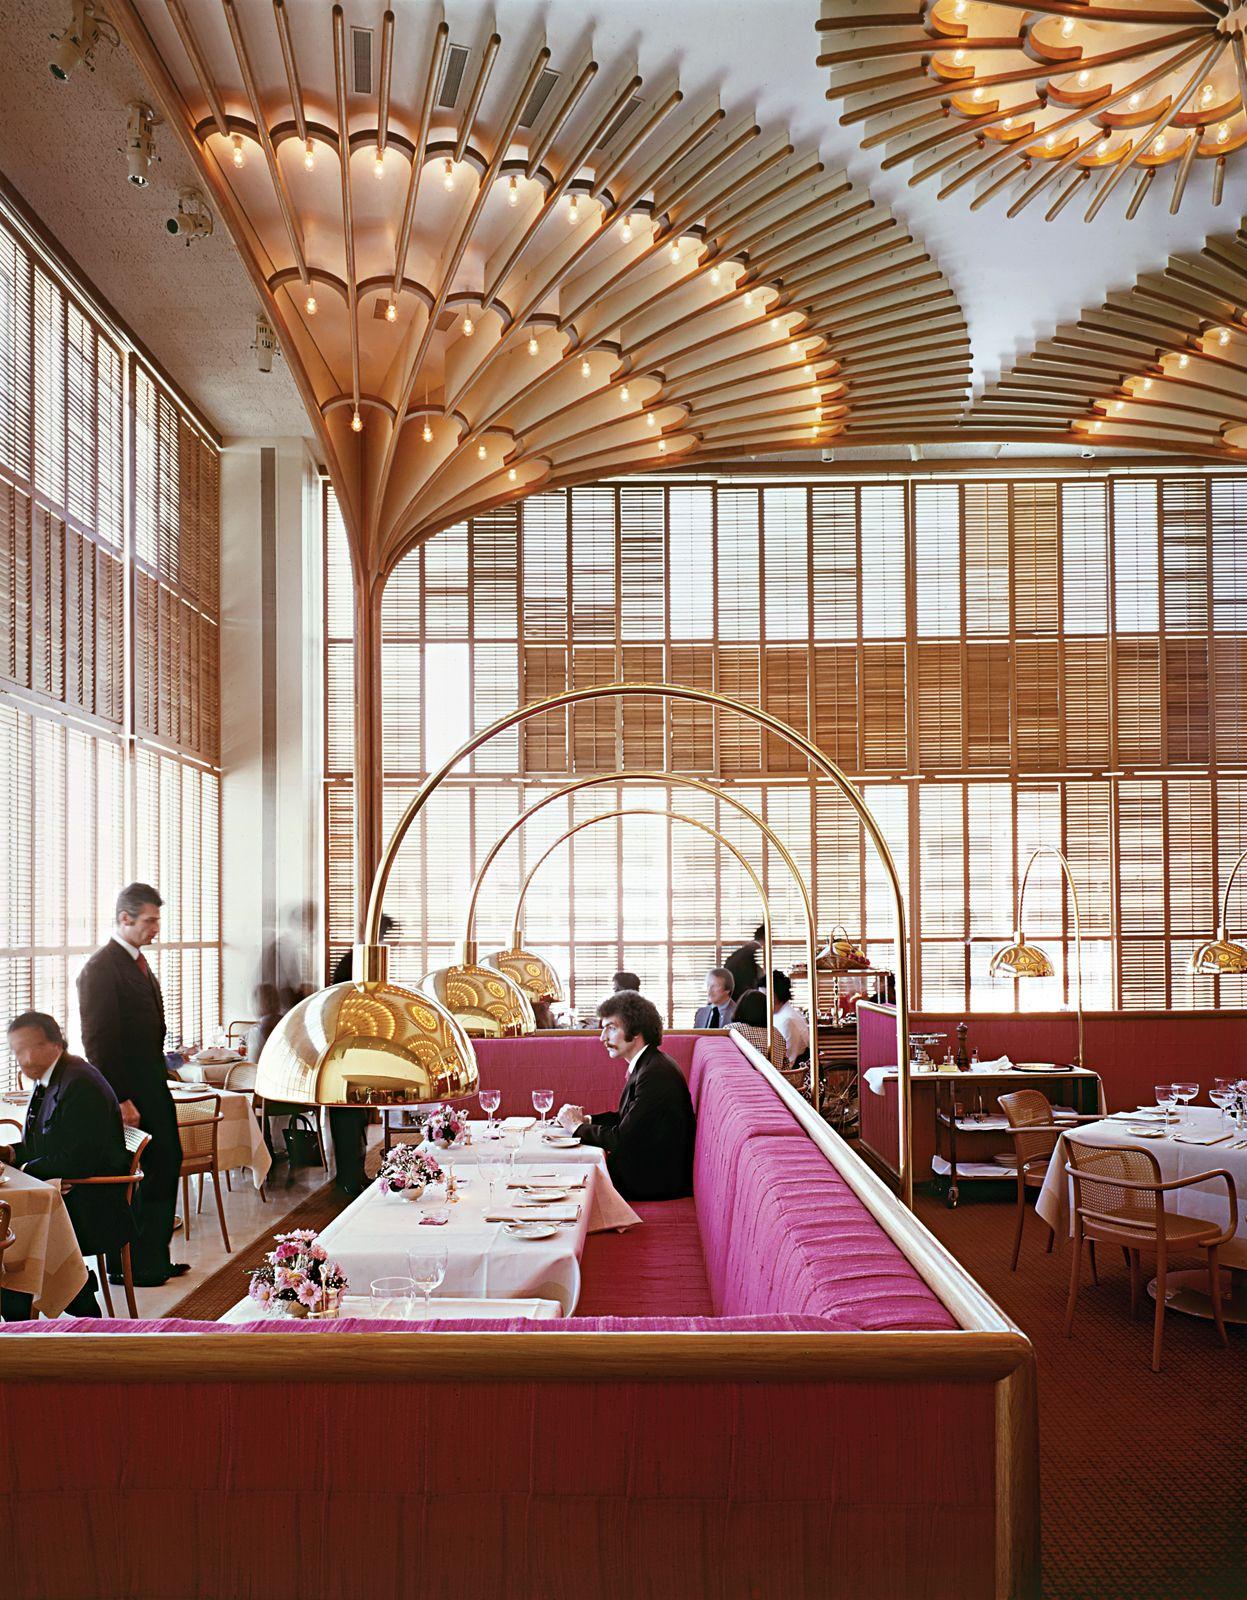 The Opulent Modernism of Platner   Warren platner, Interiors and ...